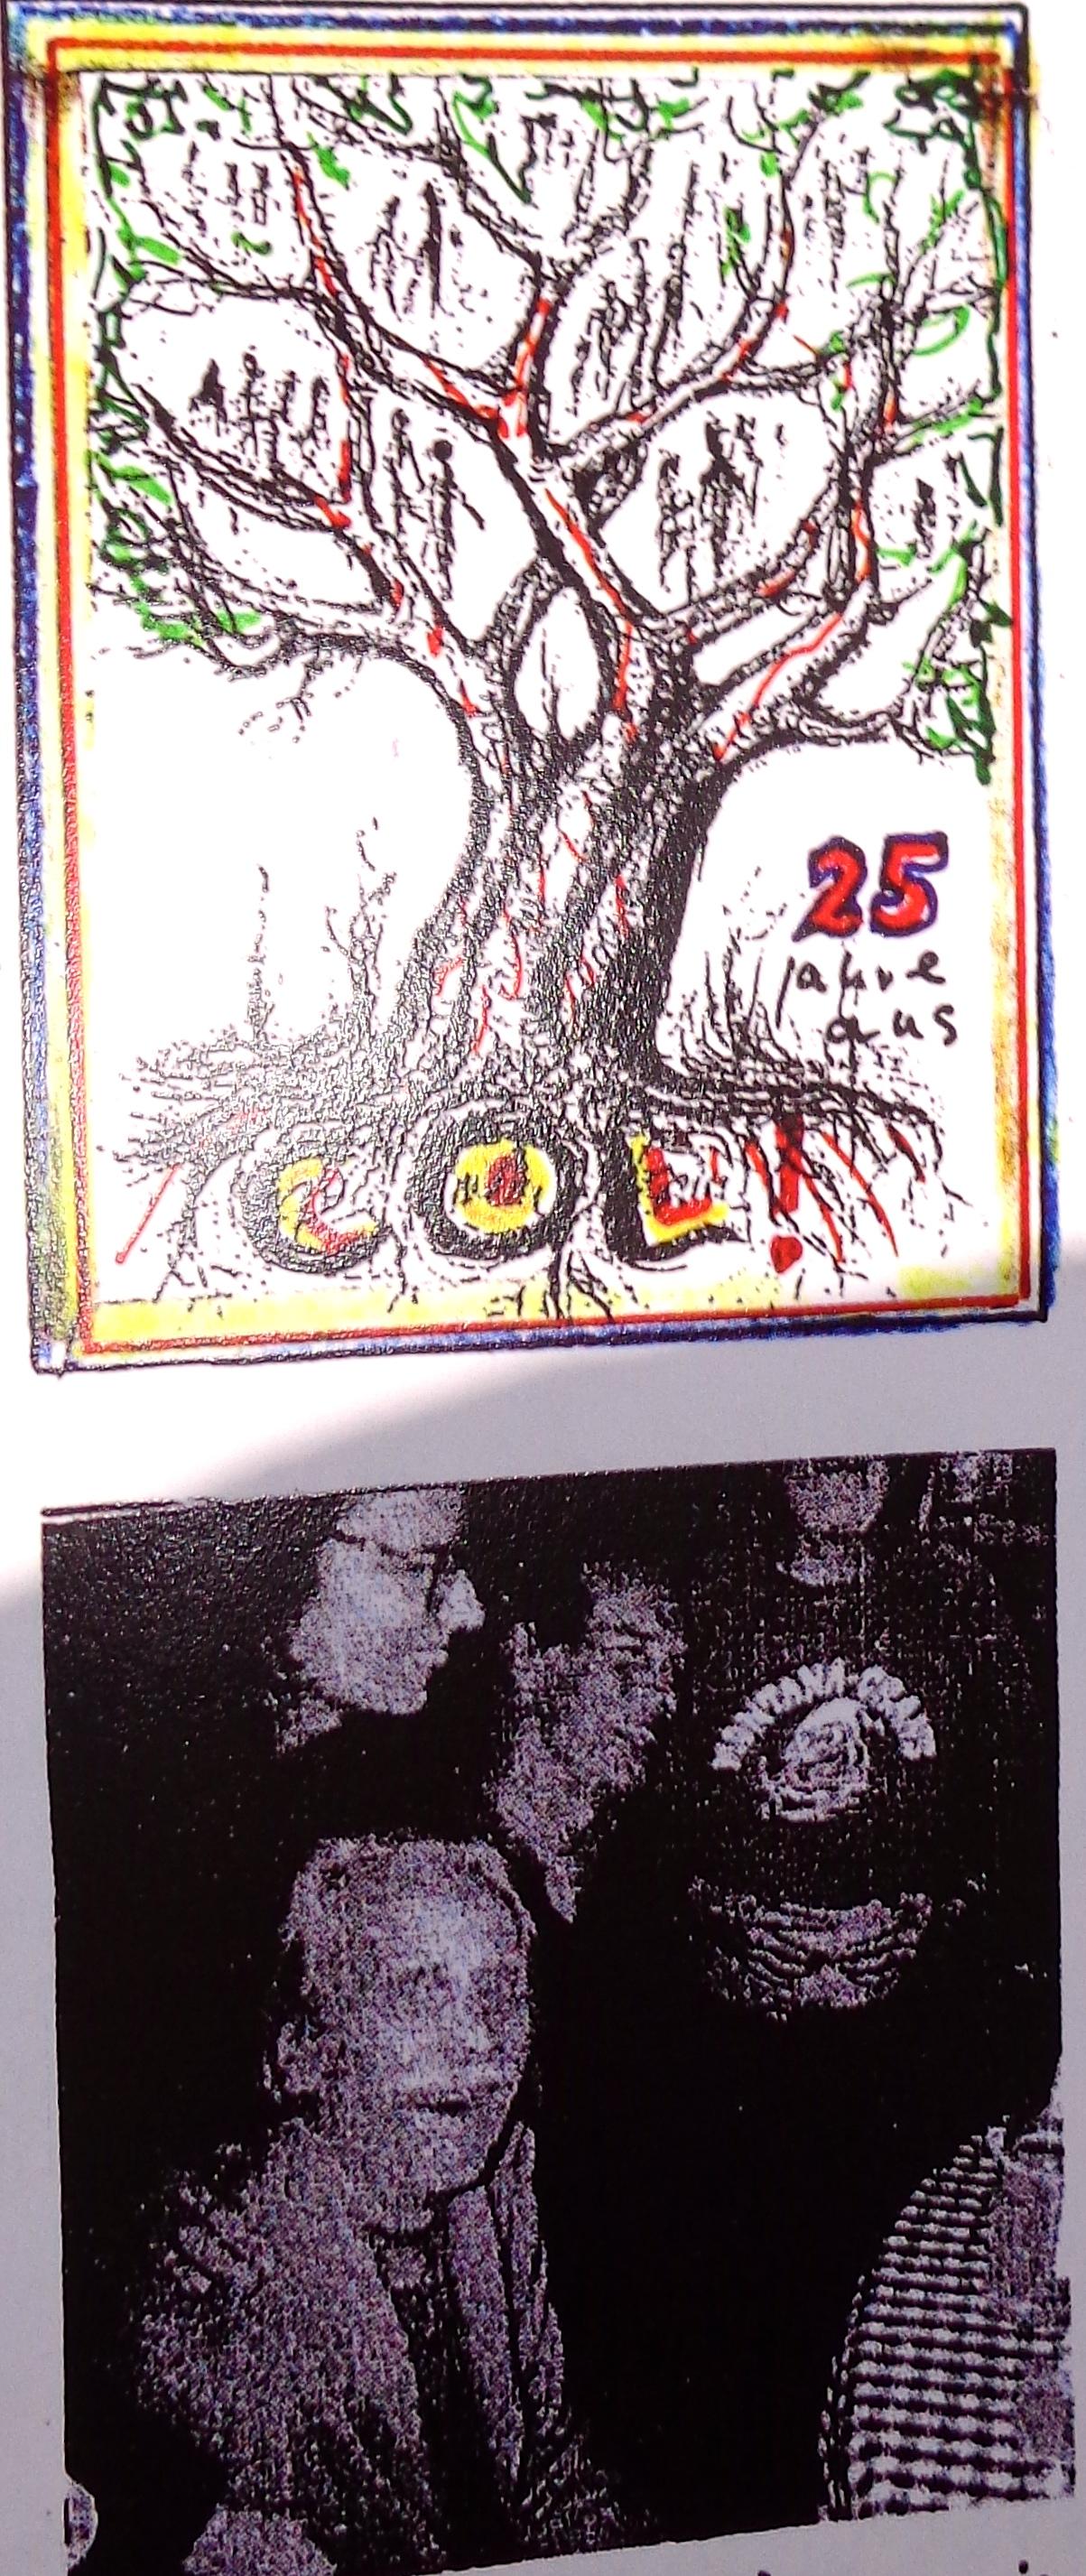 25 YEARS OF COL-ART 1993